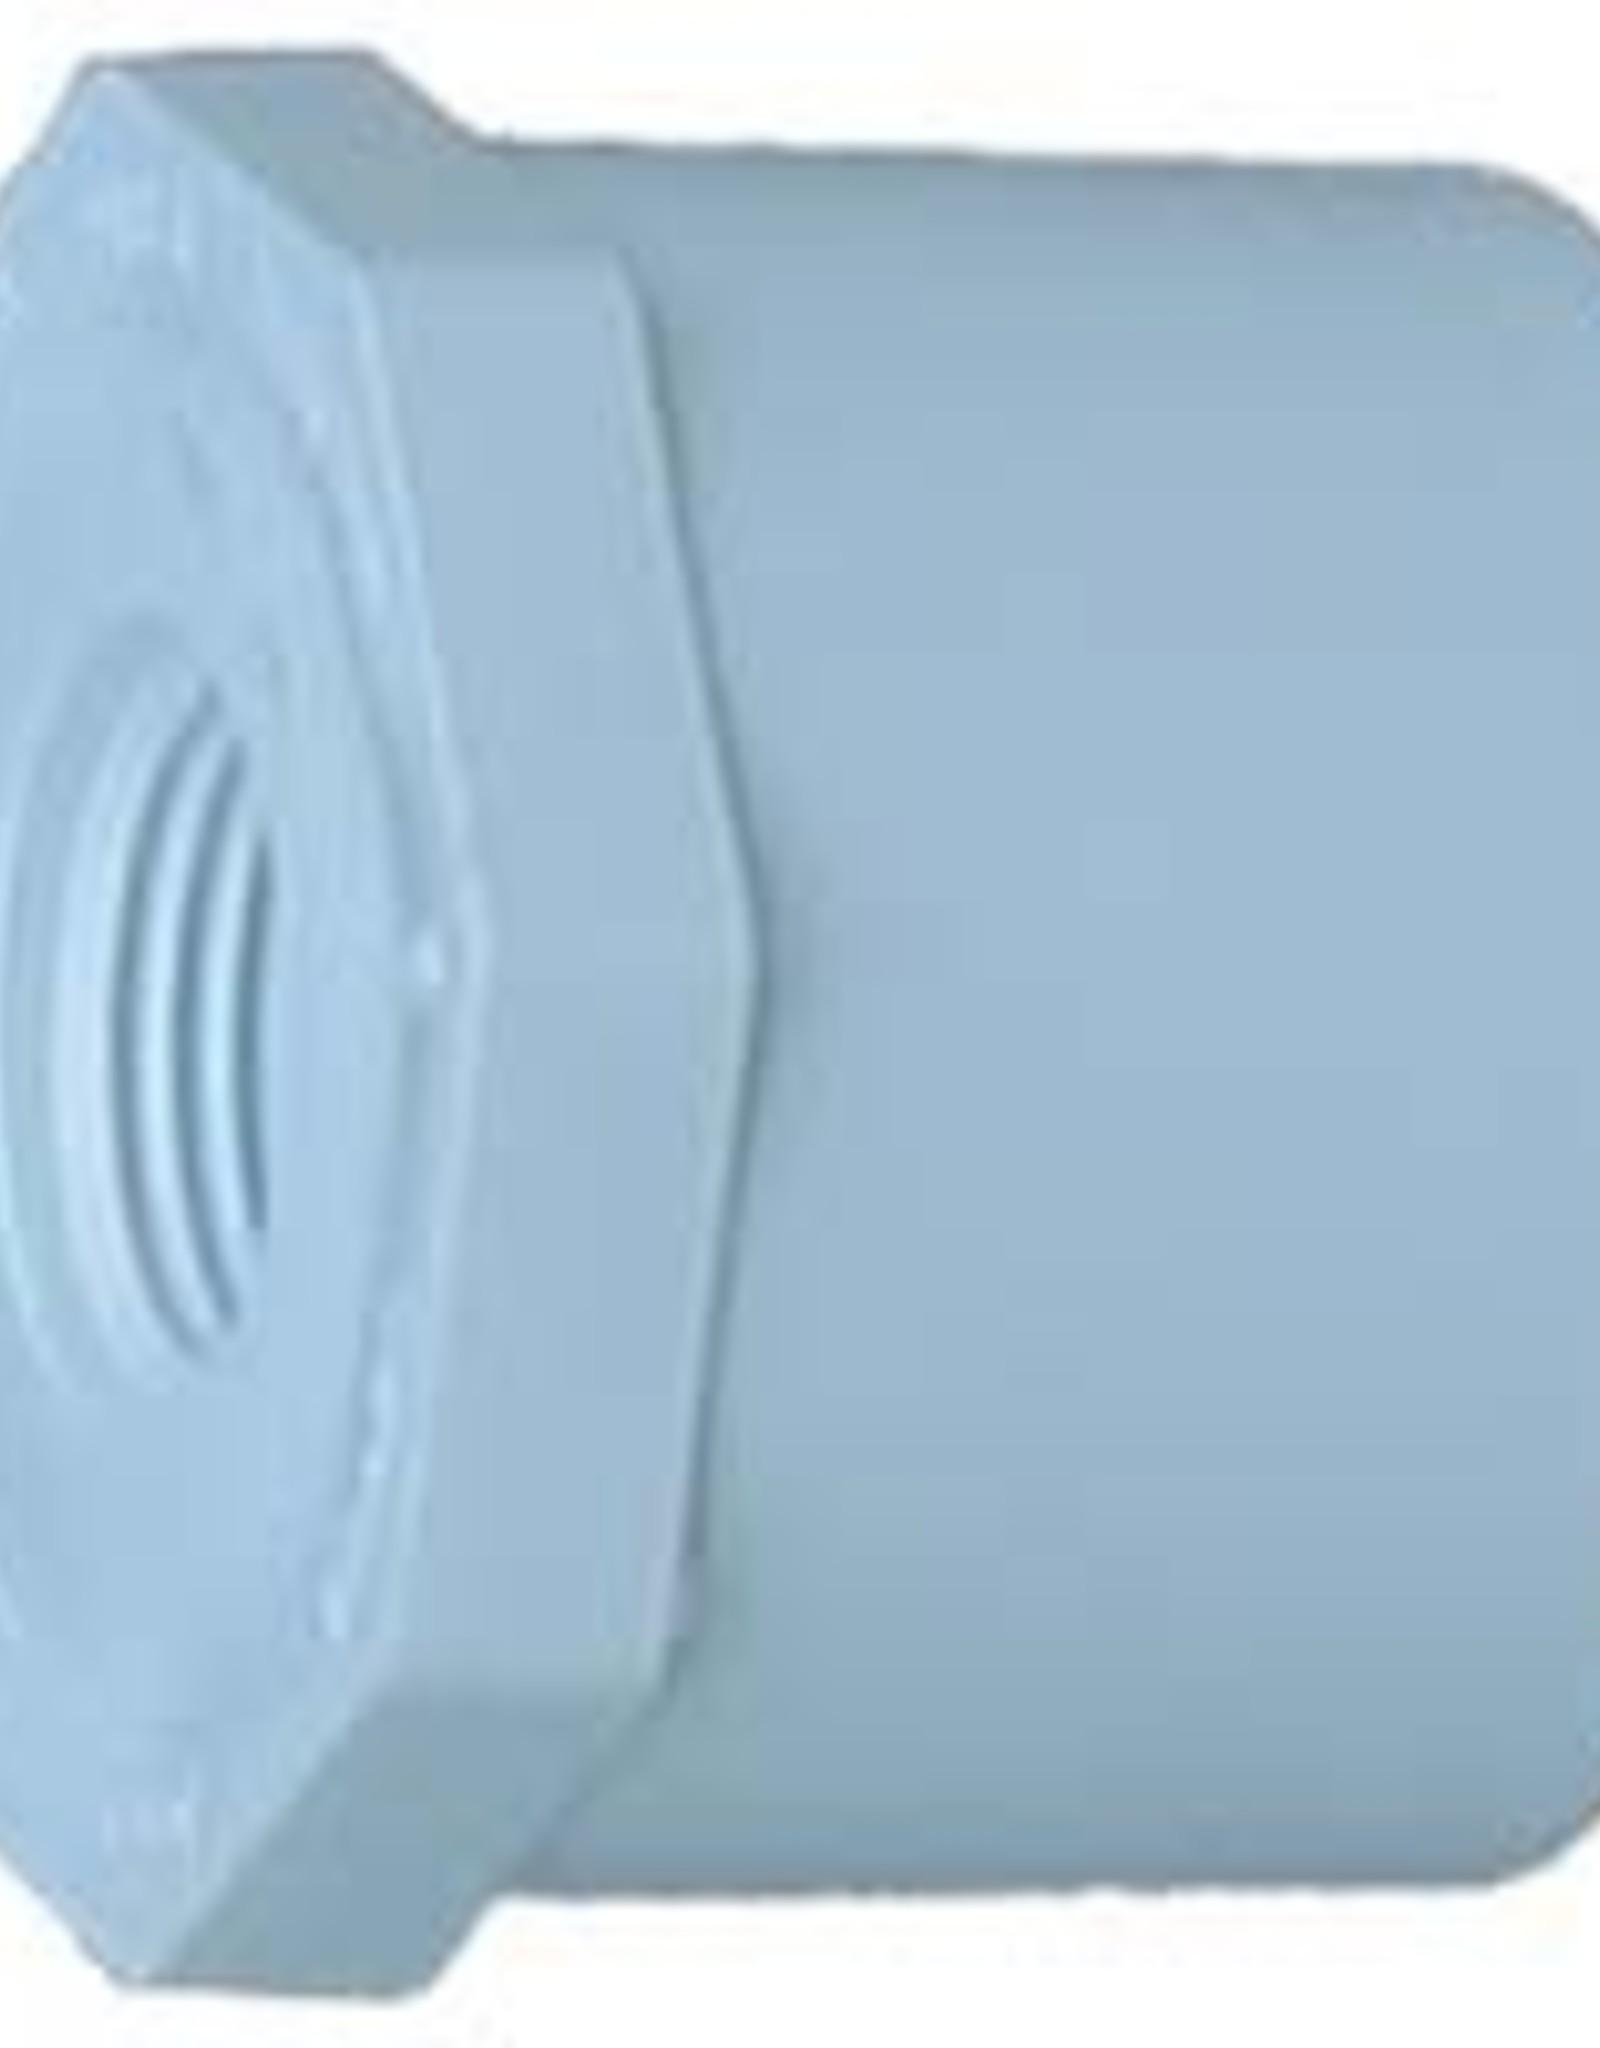 "LASCO PVC 1"" x 3/4 Reducing Bushing Slip x FPT SCH 40"